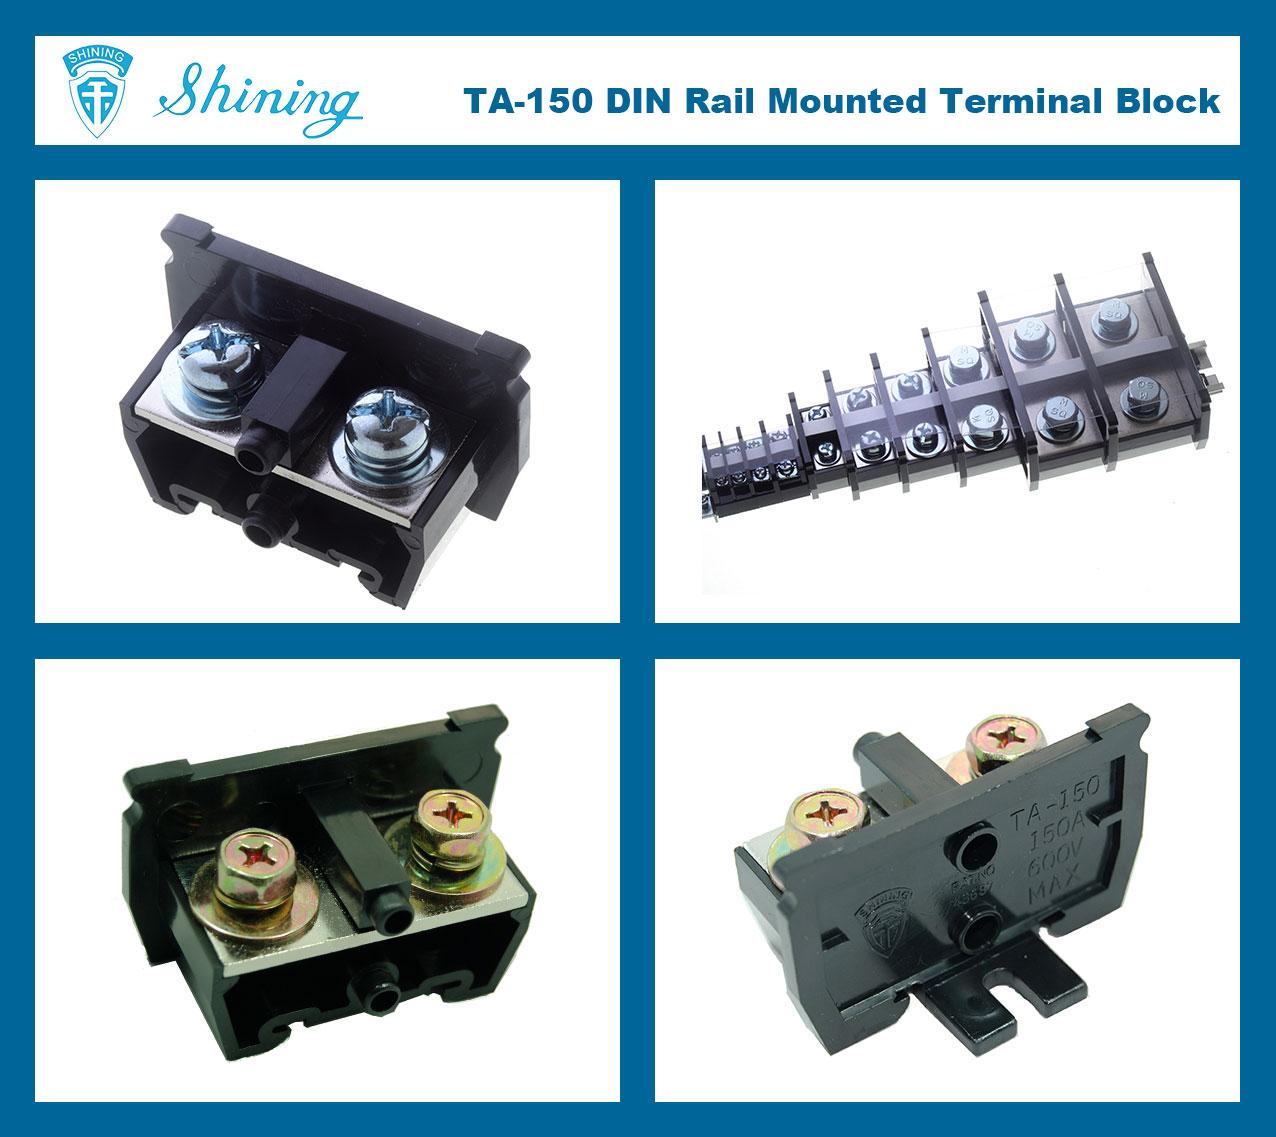 TA-150-35-mm-DIN-Rail-Electric-Wire-Connector-10A-Terminal-Block-1-Photo